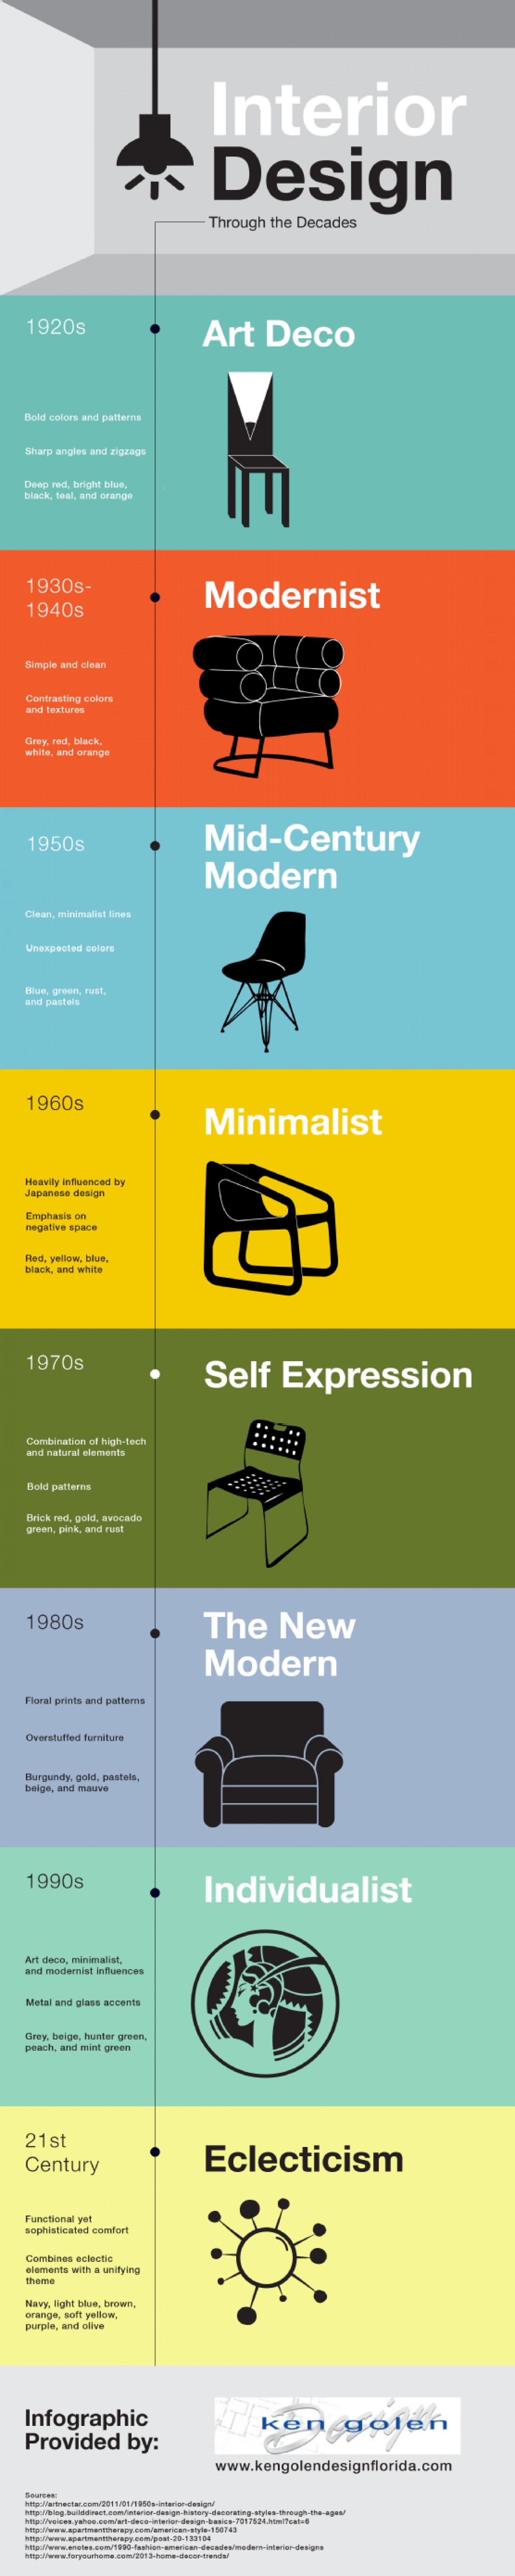 Infographic A Timeline Of Interior Design